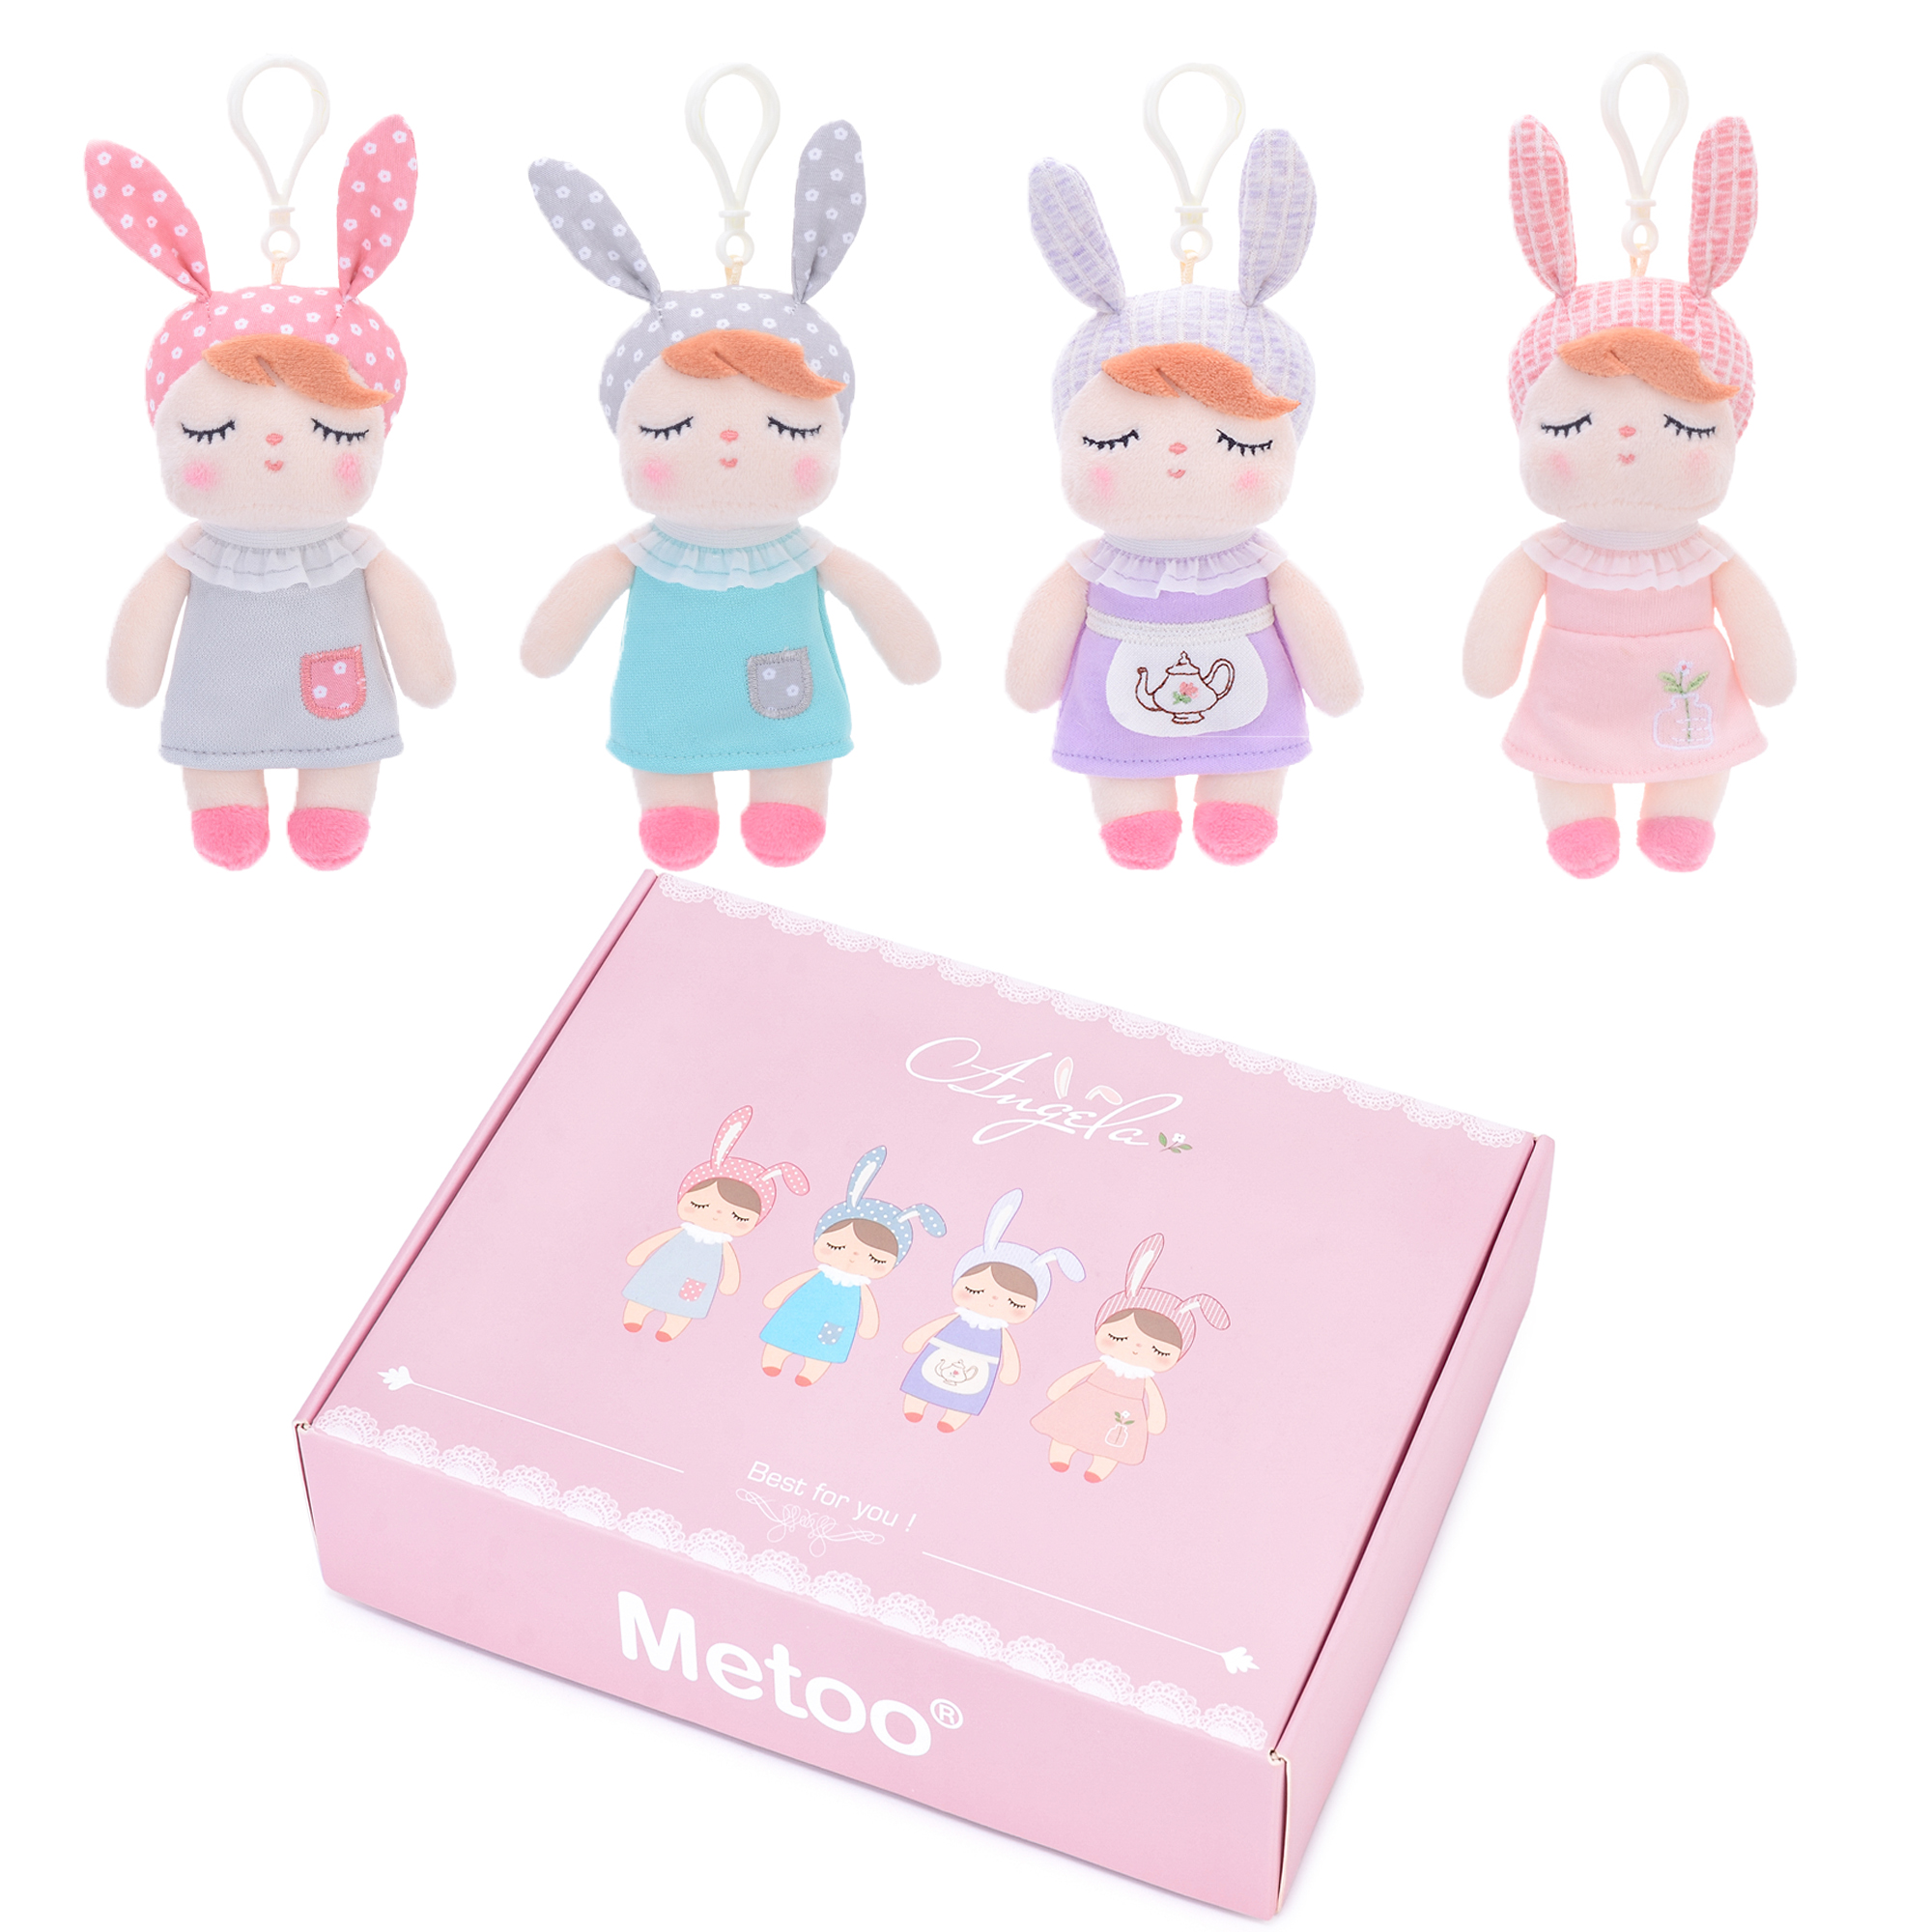 Metoo Plush Toys  Doll Soft Stuffed Animals For Girls Baby Mini Cute Rabbit Keychians For Kids Boys Christmas Gift 4 Pcs Set